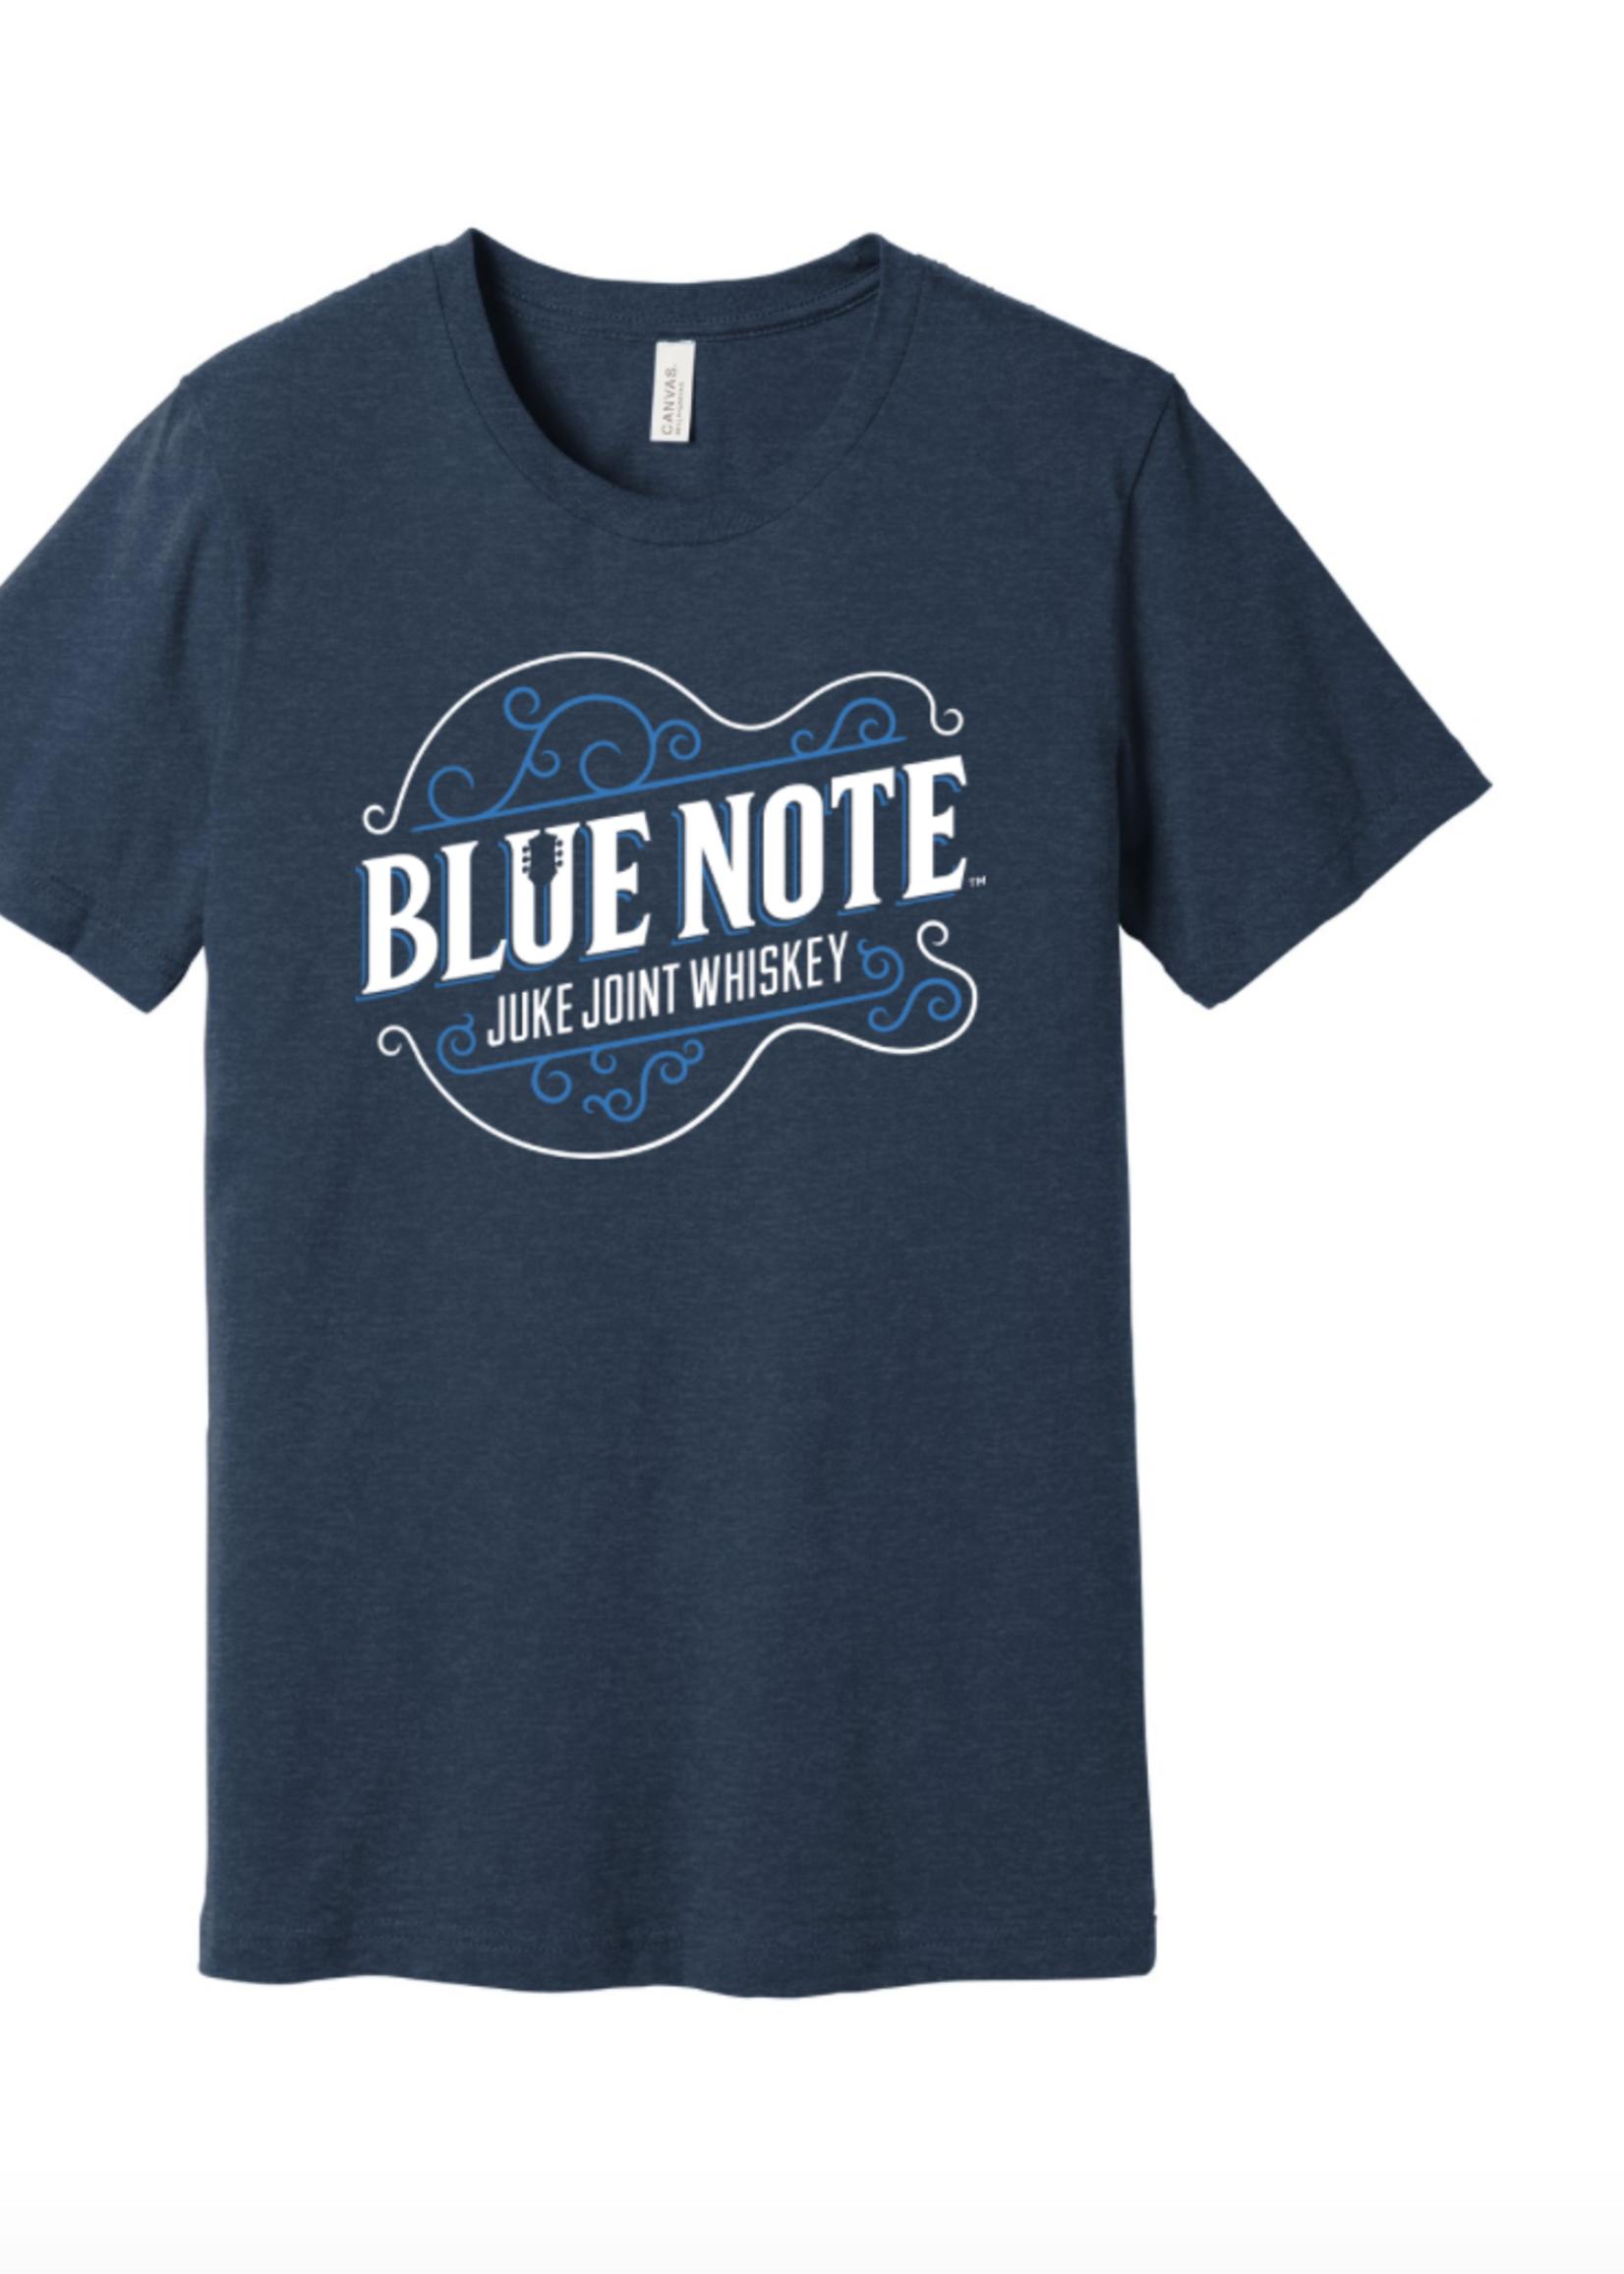 Grind City Design Blue Note Tee